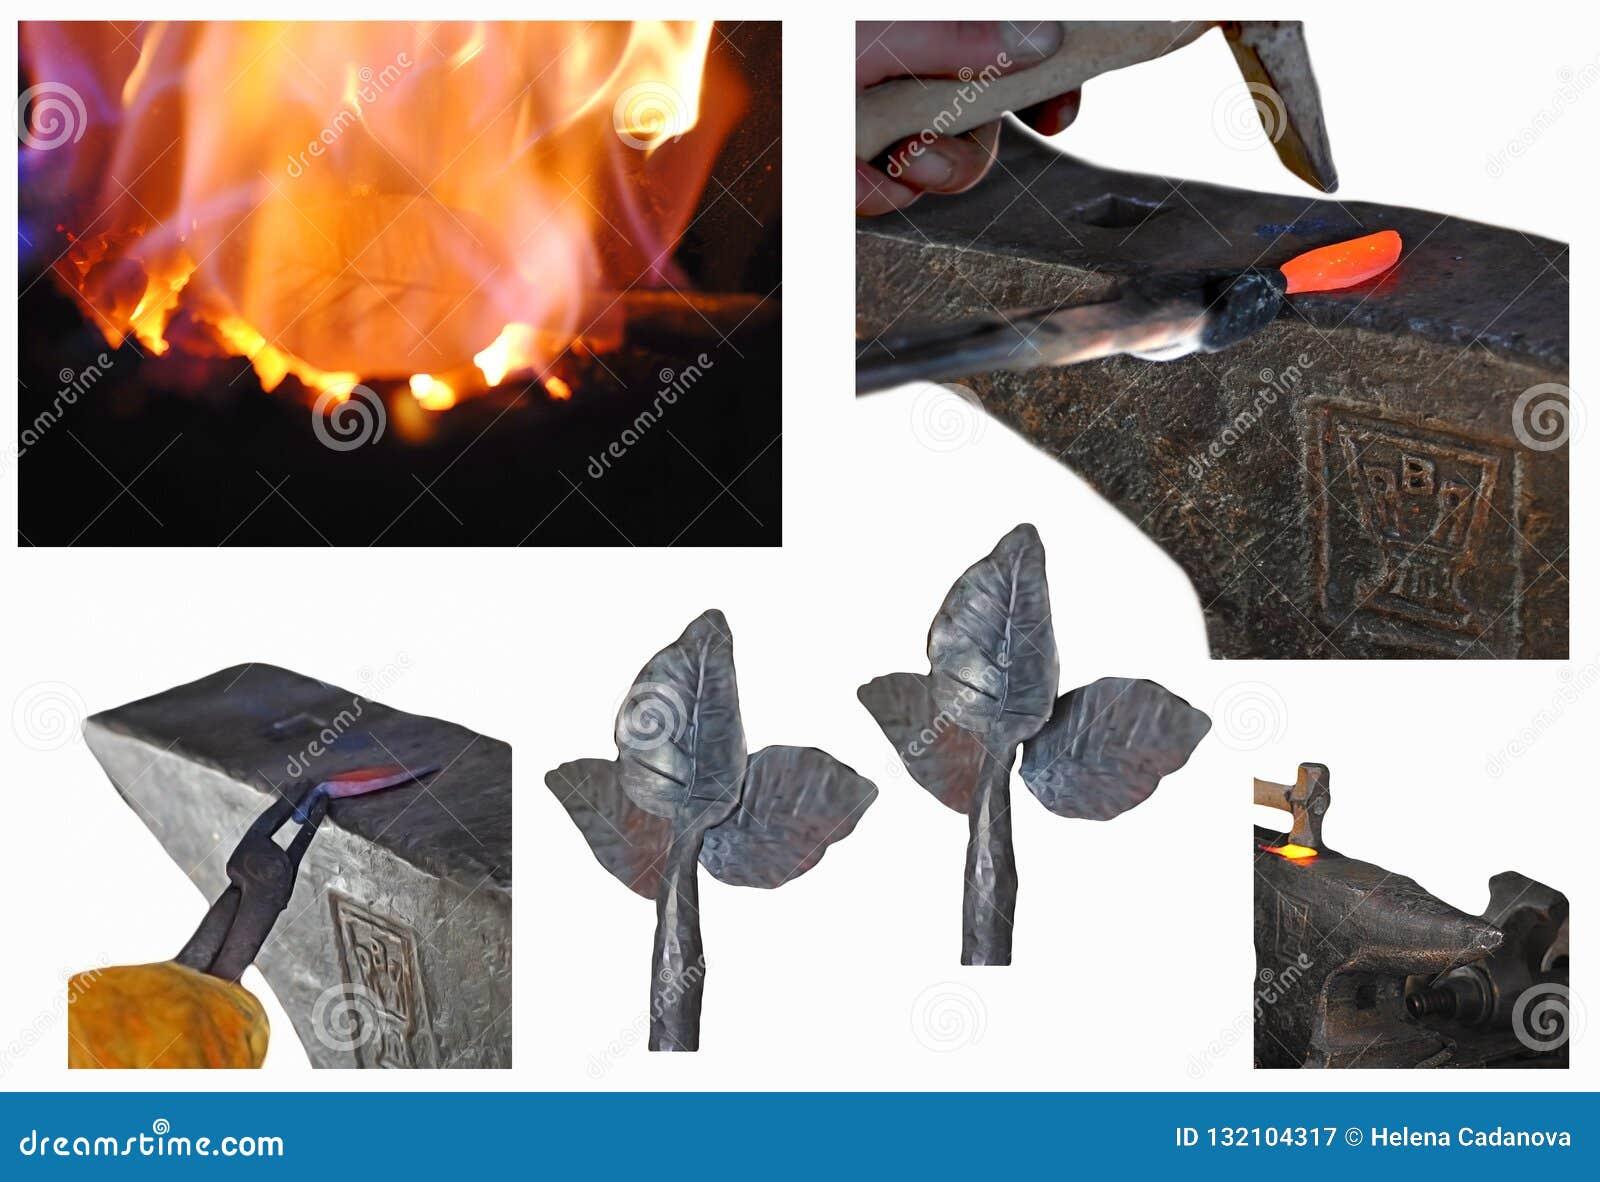 Blacksmithing Lesson Step by Step